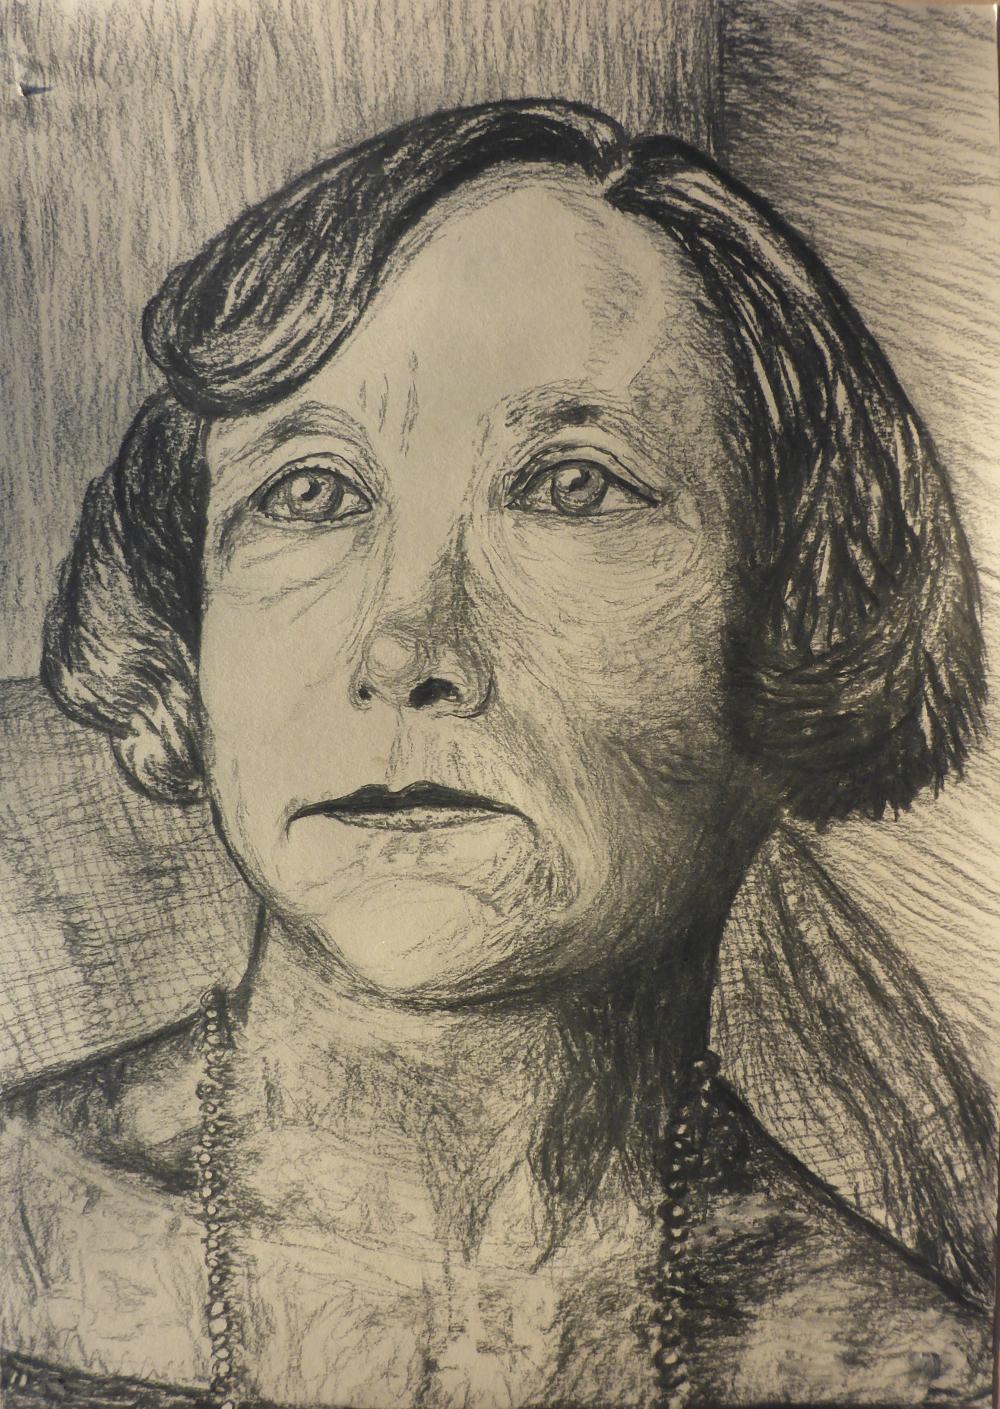 """Gabriele"", 2019, charcoal on paper, 42 x 59 cm"